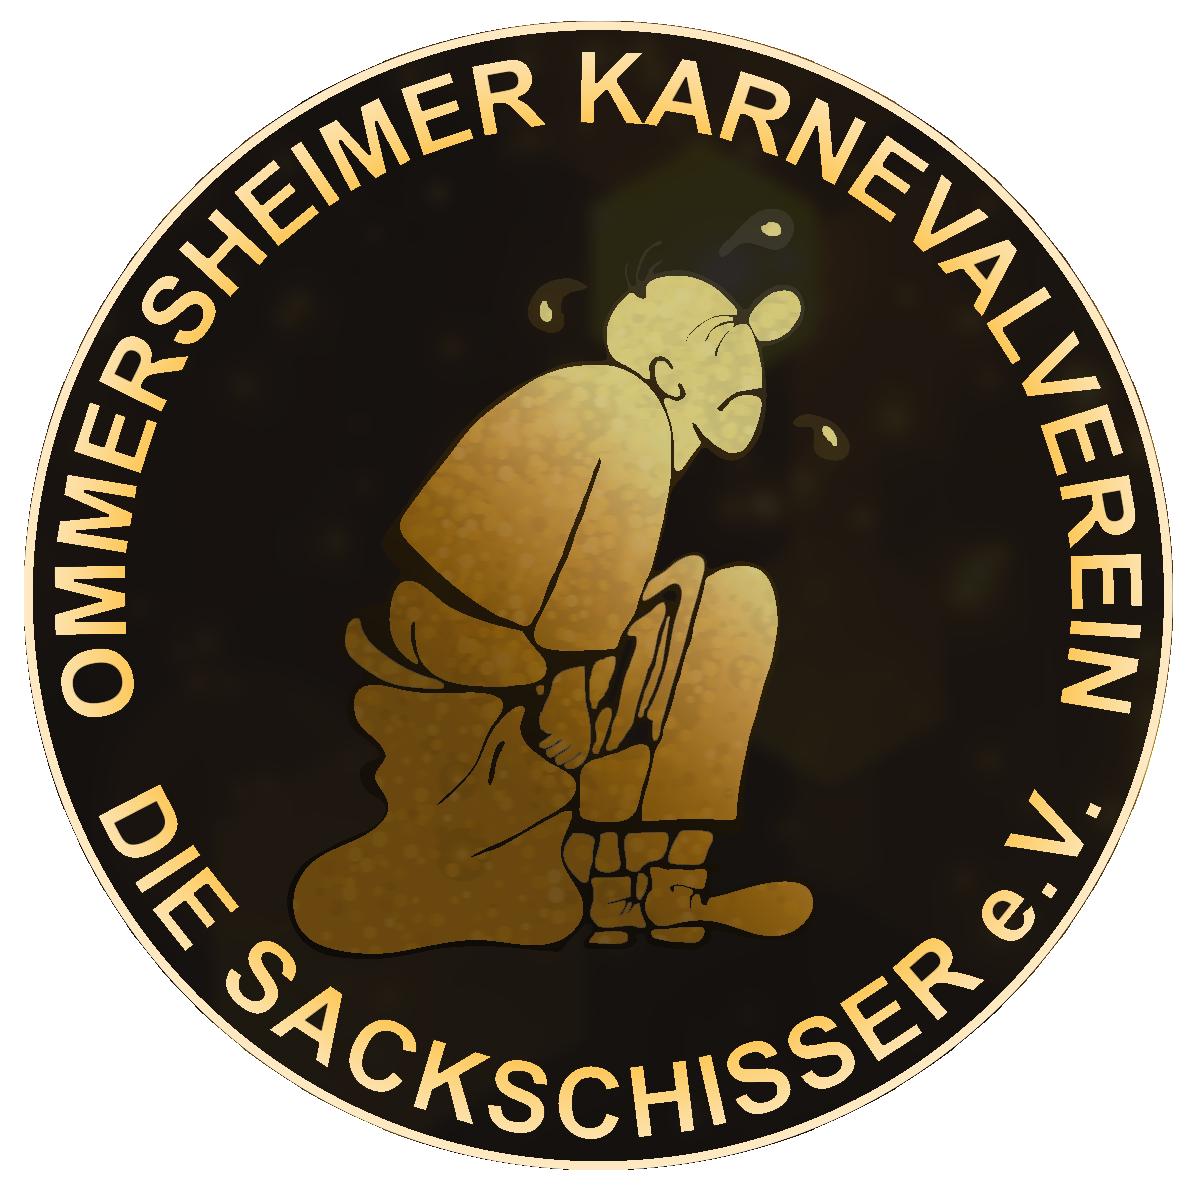 SACKSCHISSER